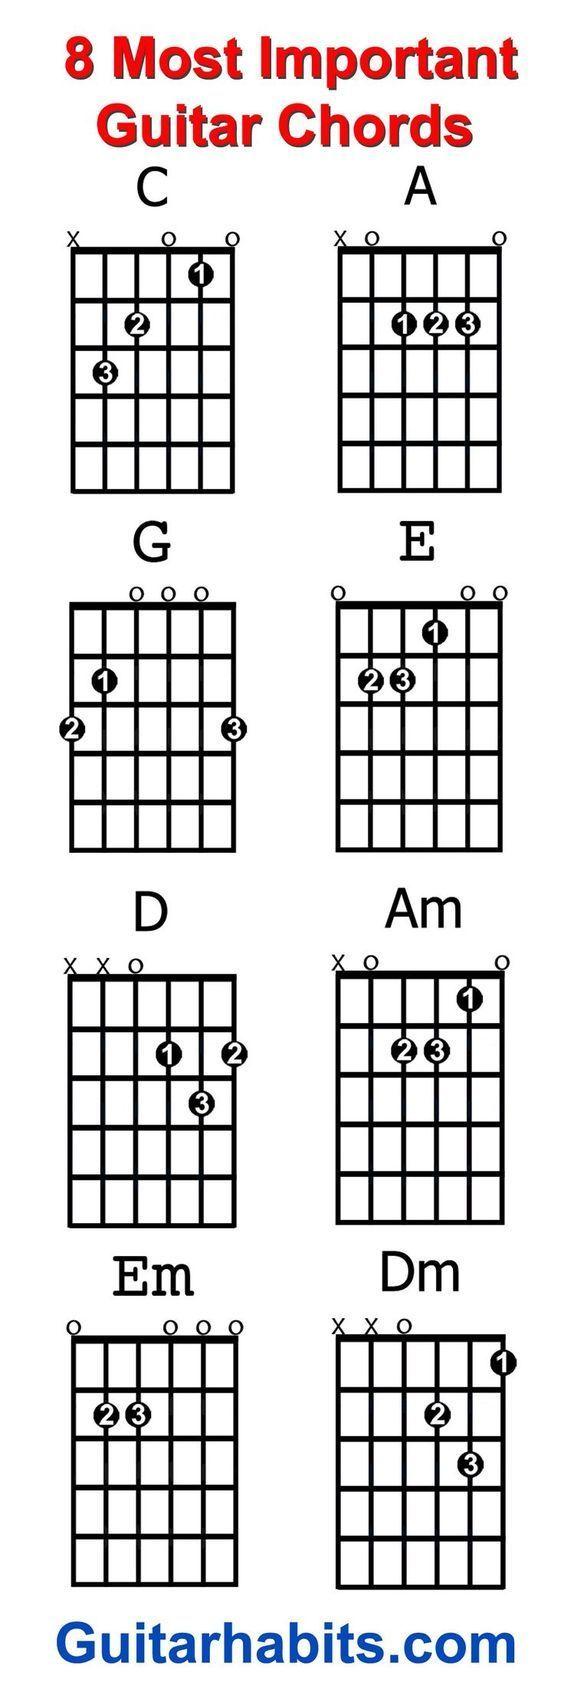 51 Best Guitars Images On Pinterest Guitar Chord Guitar Chords